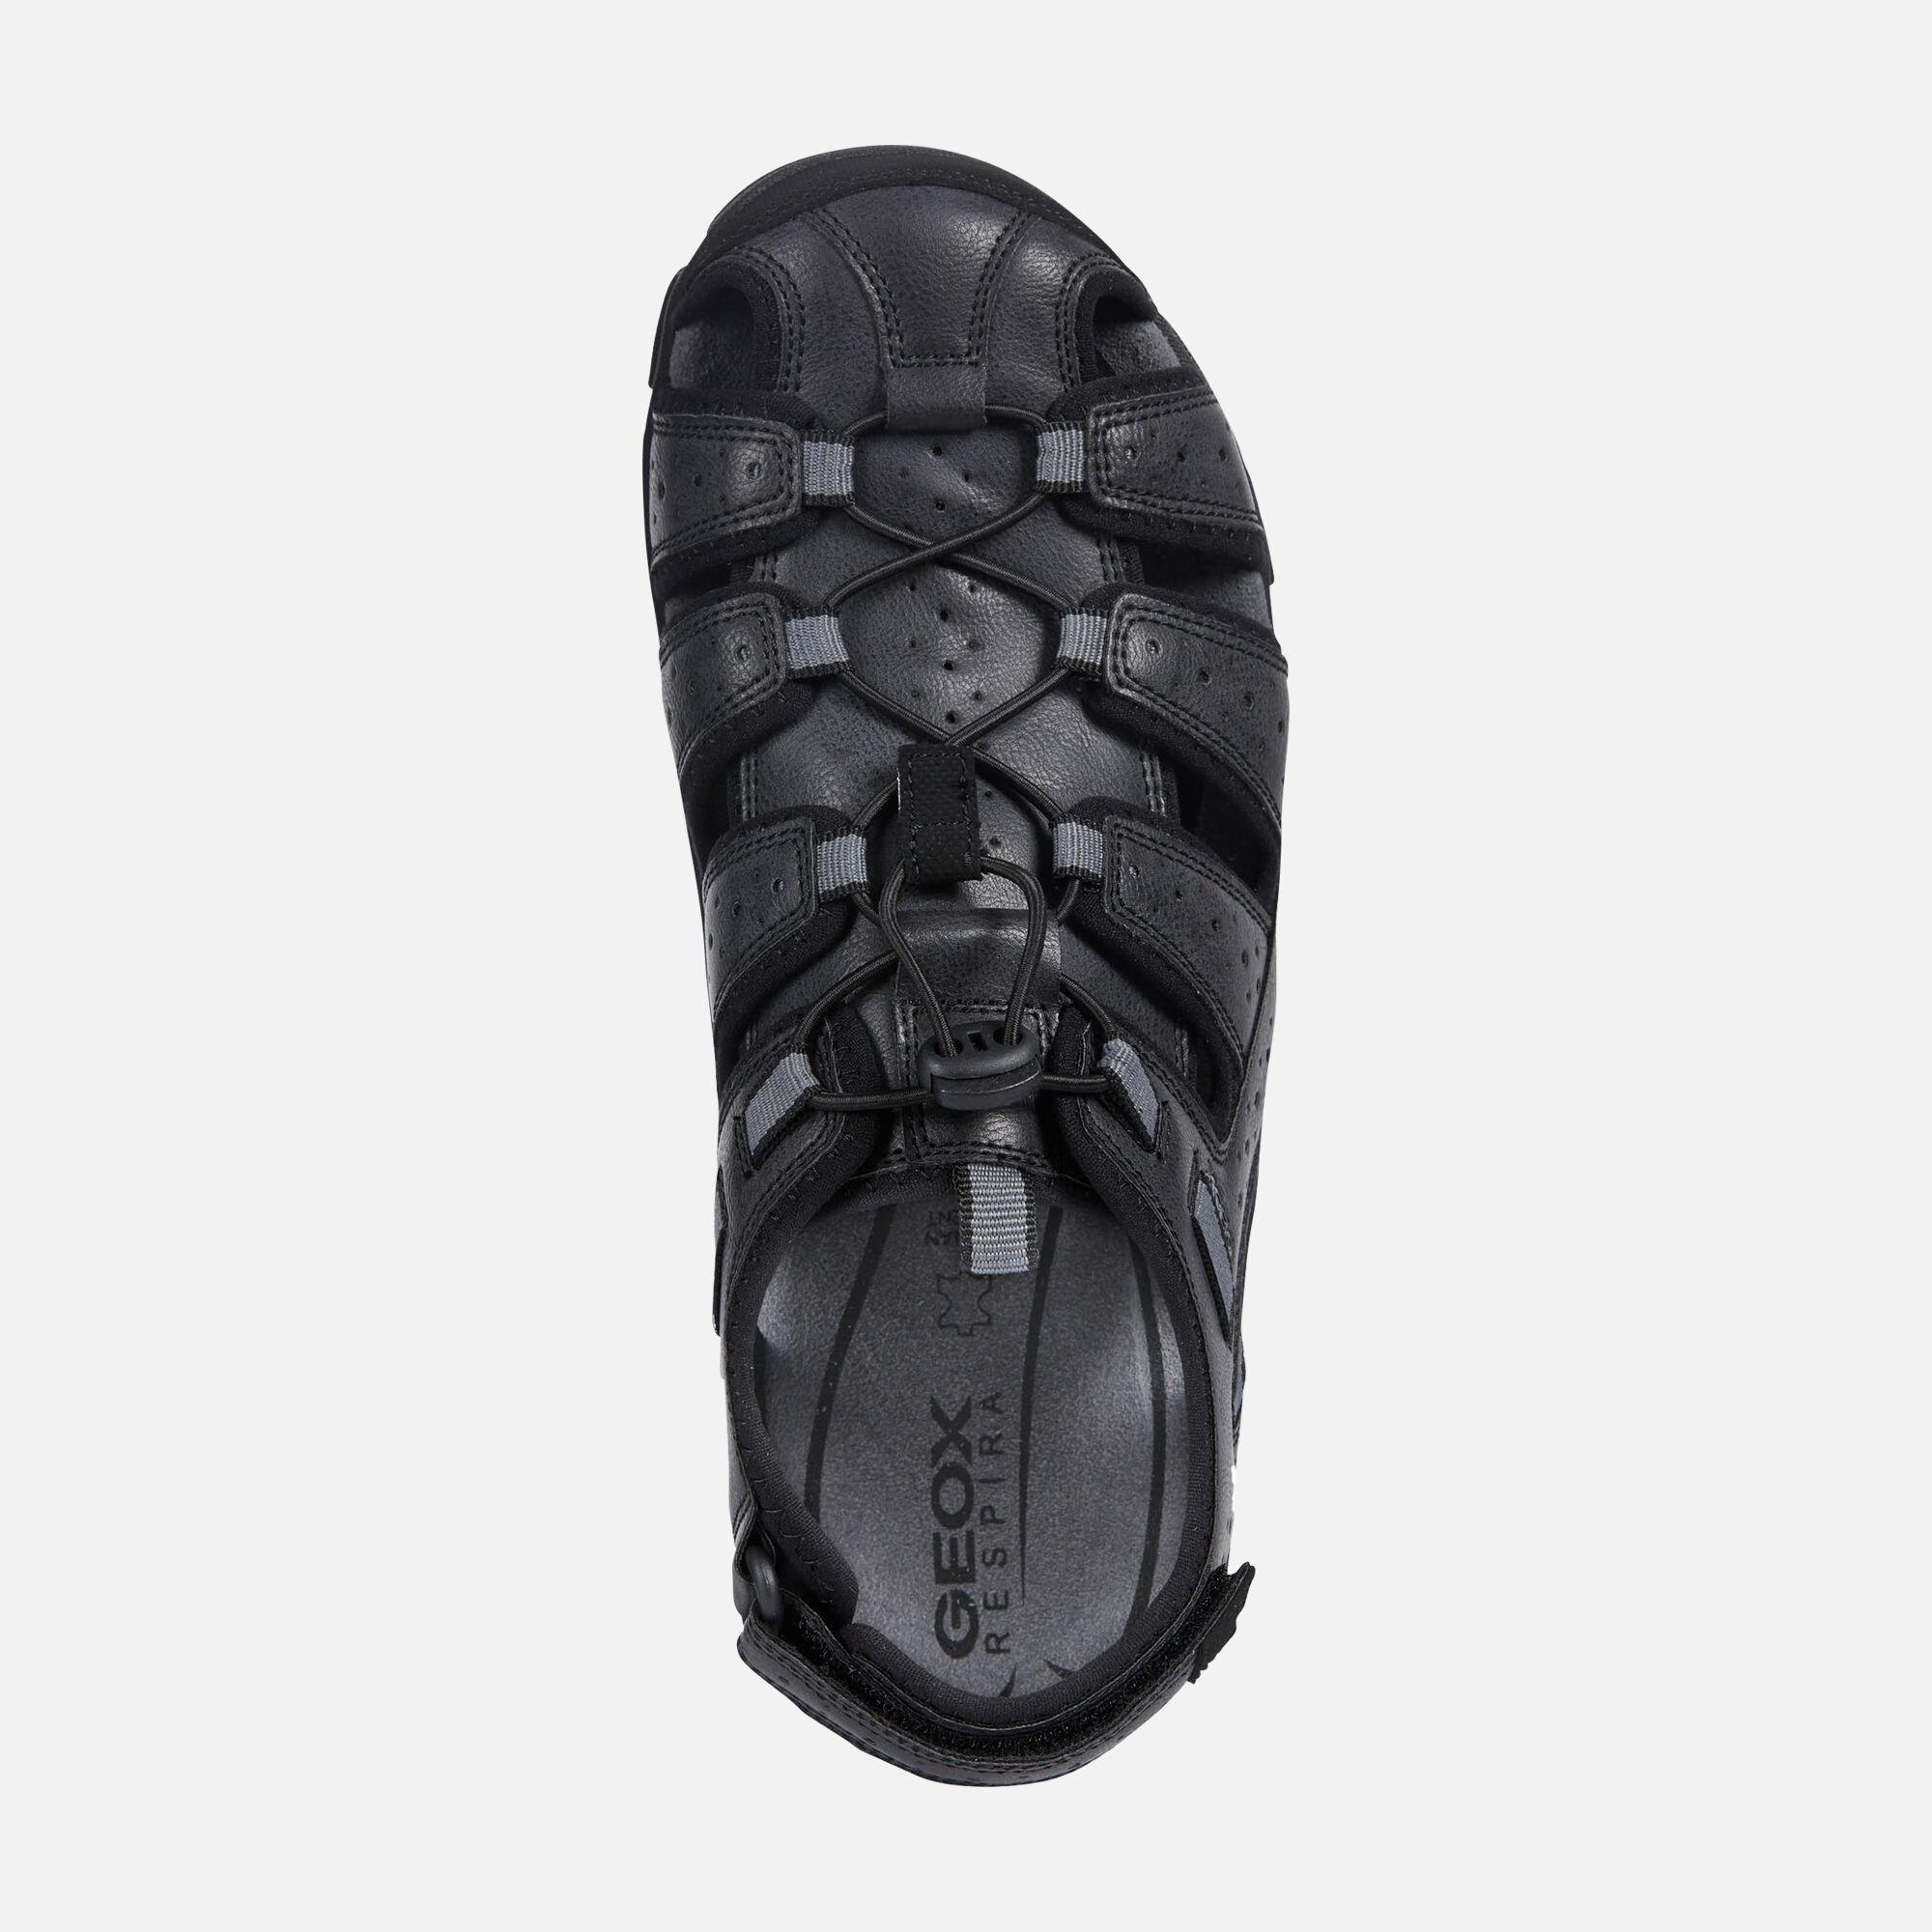 Geox Schuhe Online Shop, Geox STRADA Walking sandal Herren